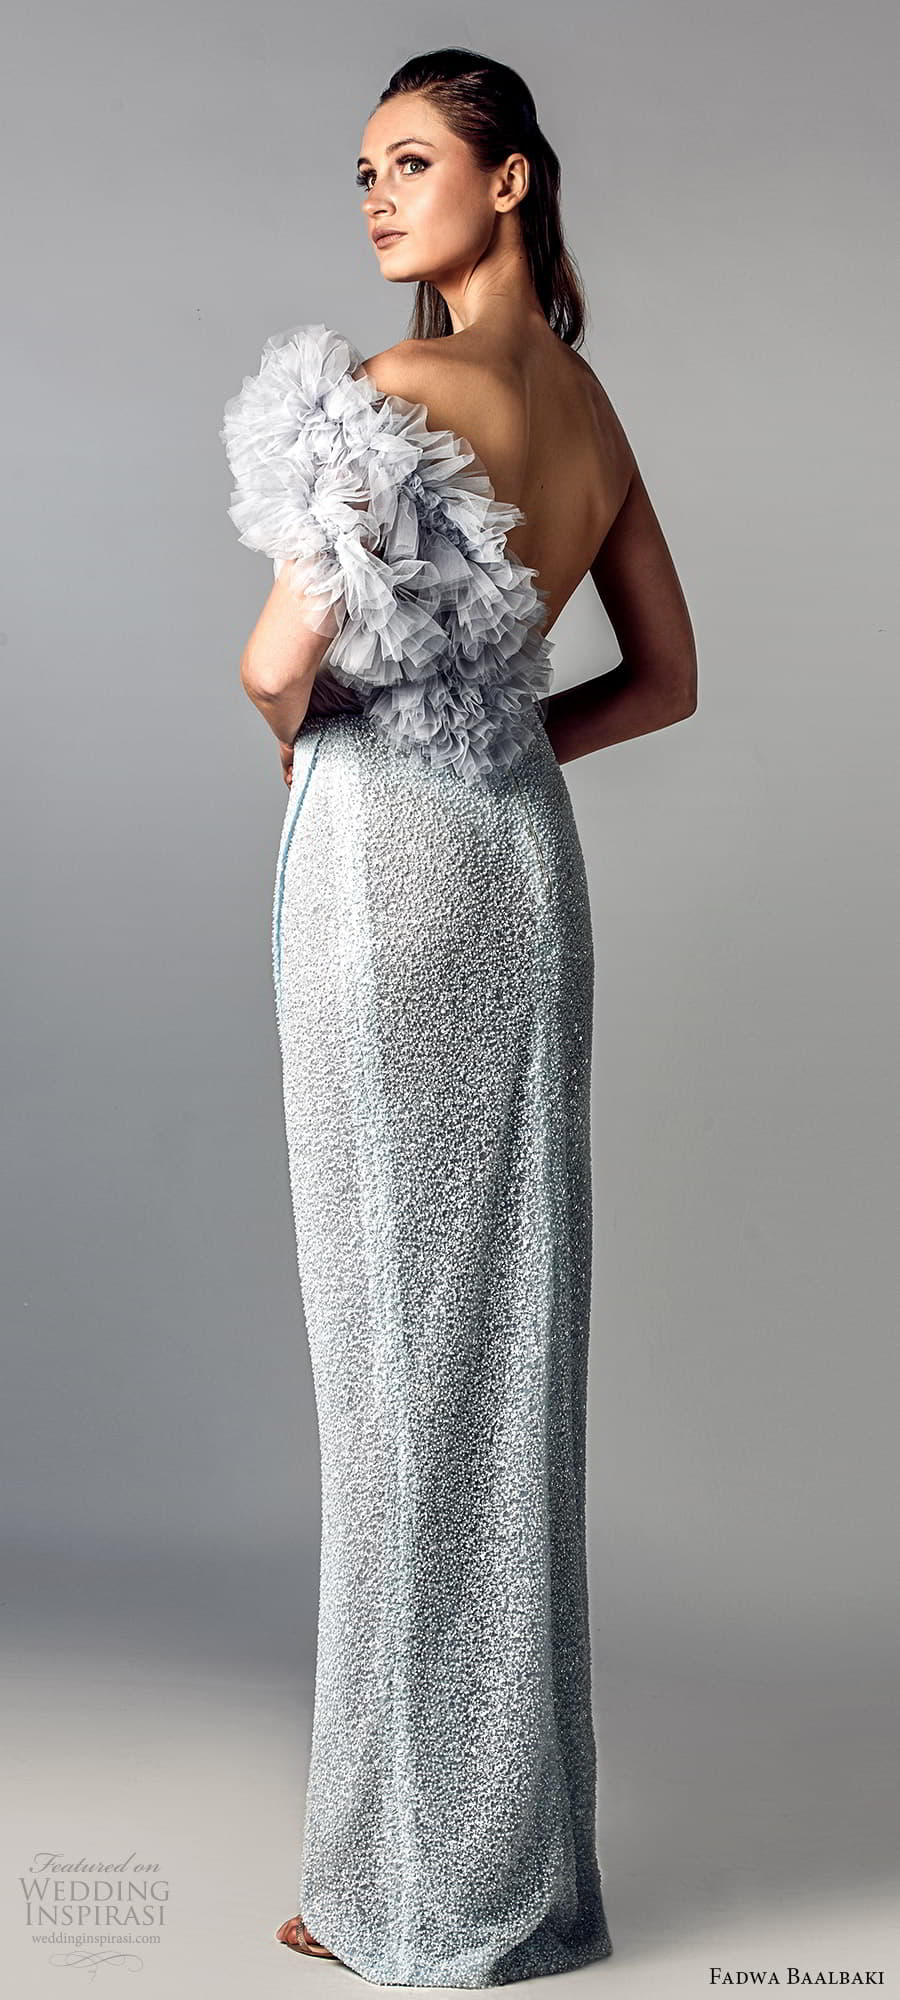 fadwa baalbaki spring 2021 bridal one shoulder strap ruched bodice sheath wedding dress light blue slit skirt (12) bv